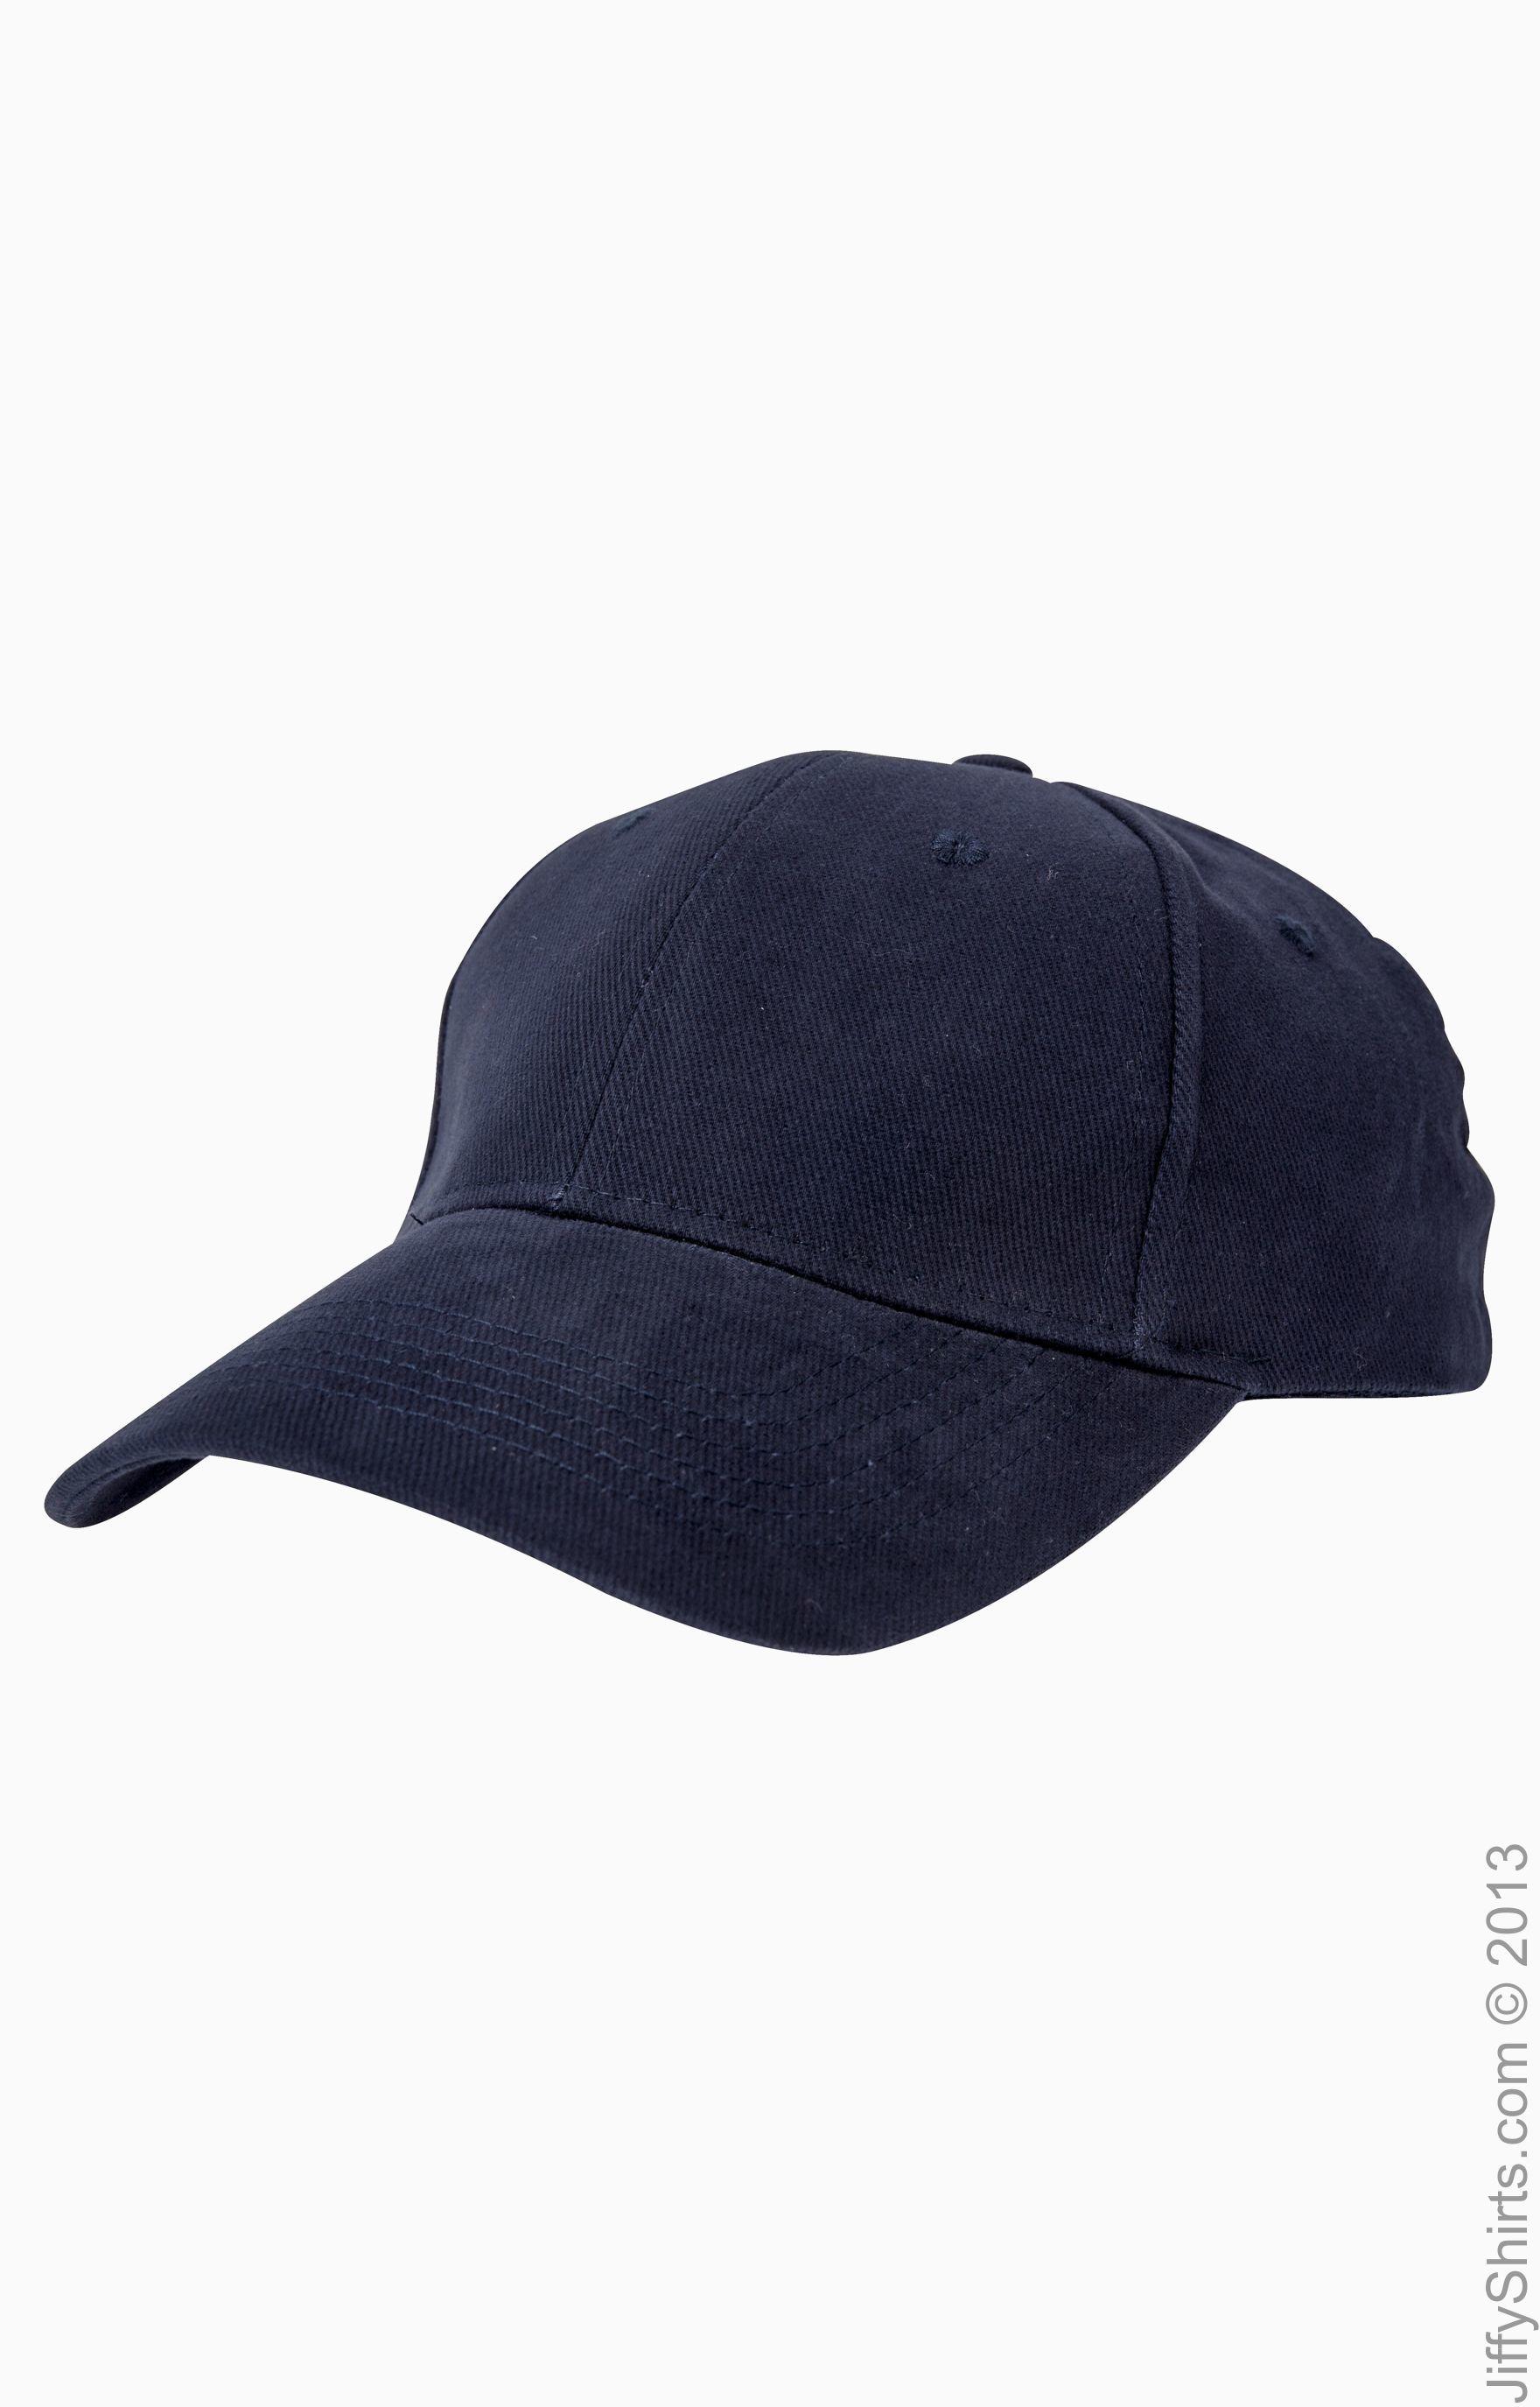 Anvil 136 6-Panel Brushed Twill Cap